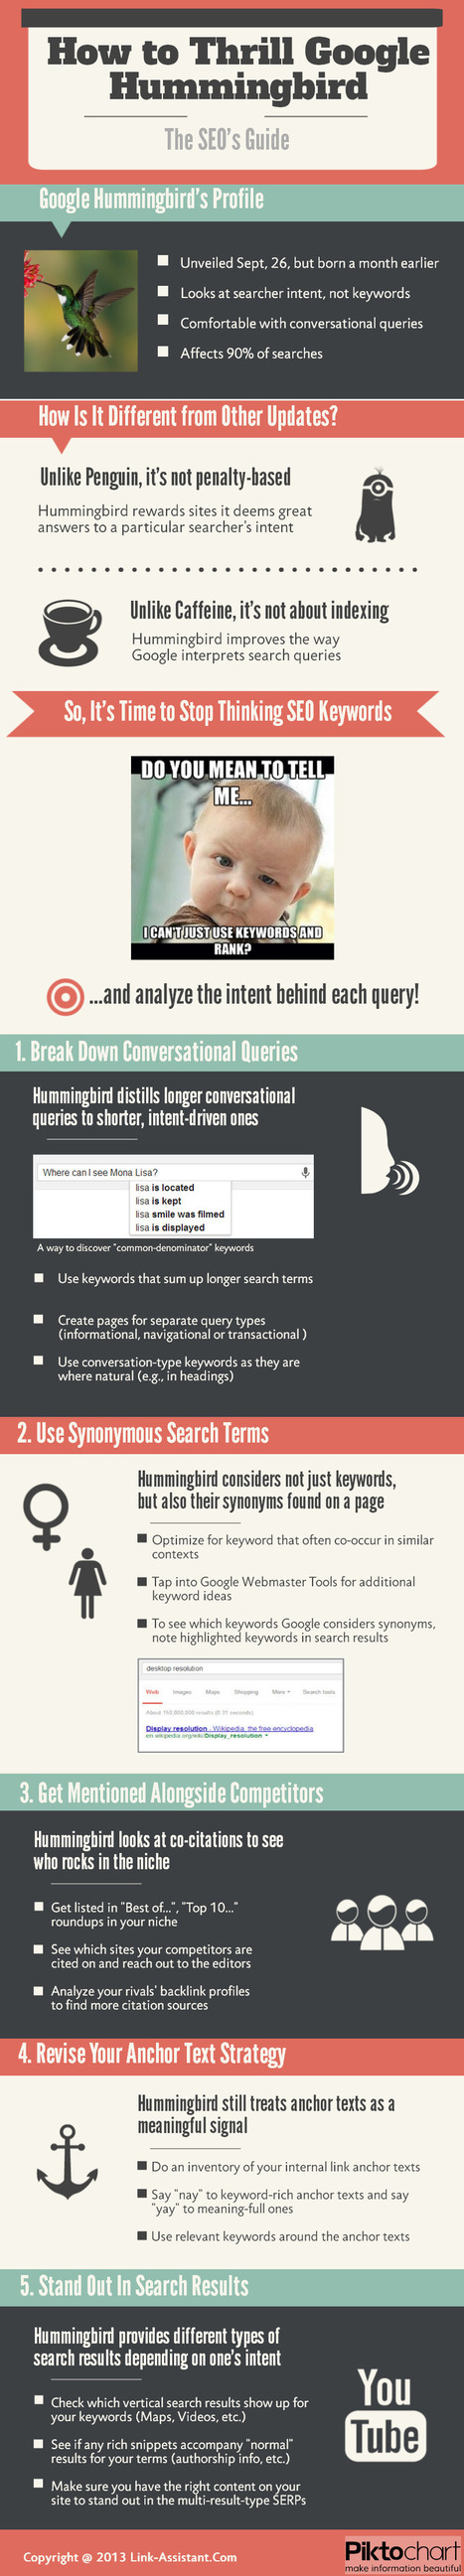 INFOGRAPHIC - How to Thrill Google Hummingbird | Social Media | Scoop.it